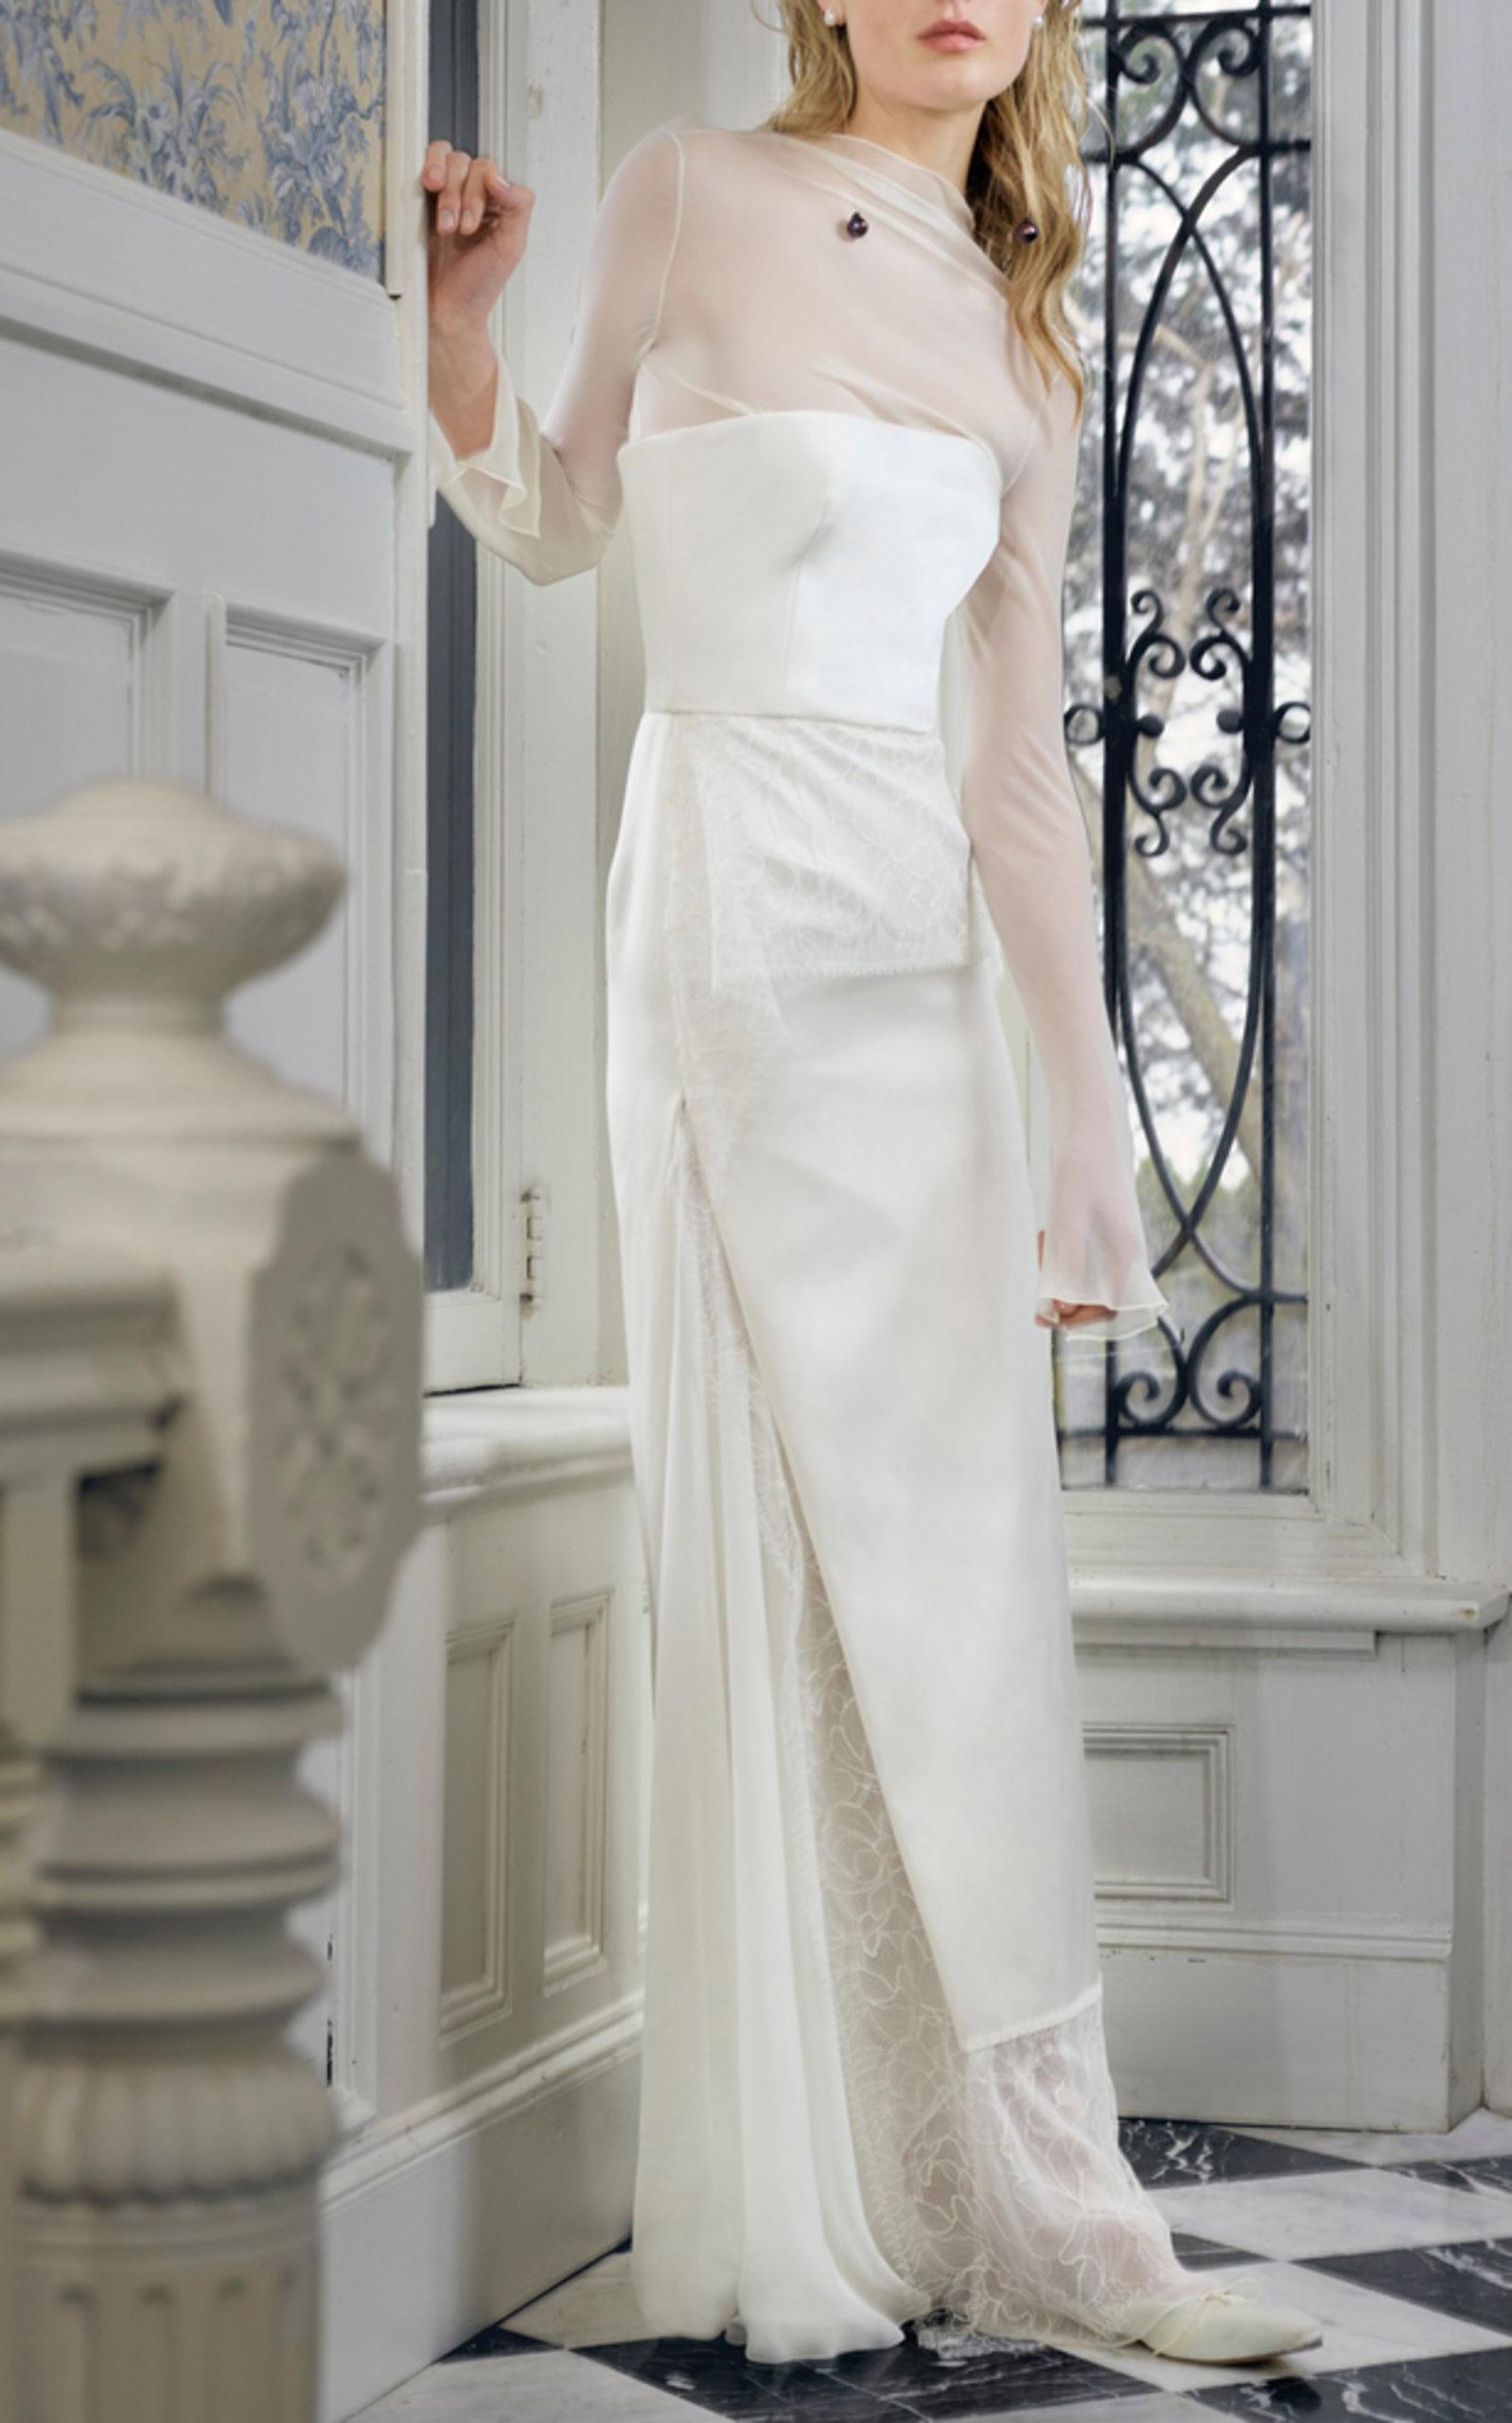 4c32d8aa544a6 Danielle FrankelPoppy Duchesse Strapless Column Gown. CLOSE. FULL SCREEN